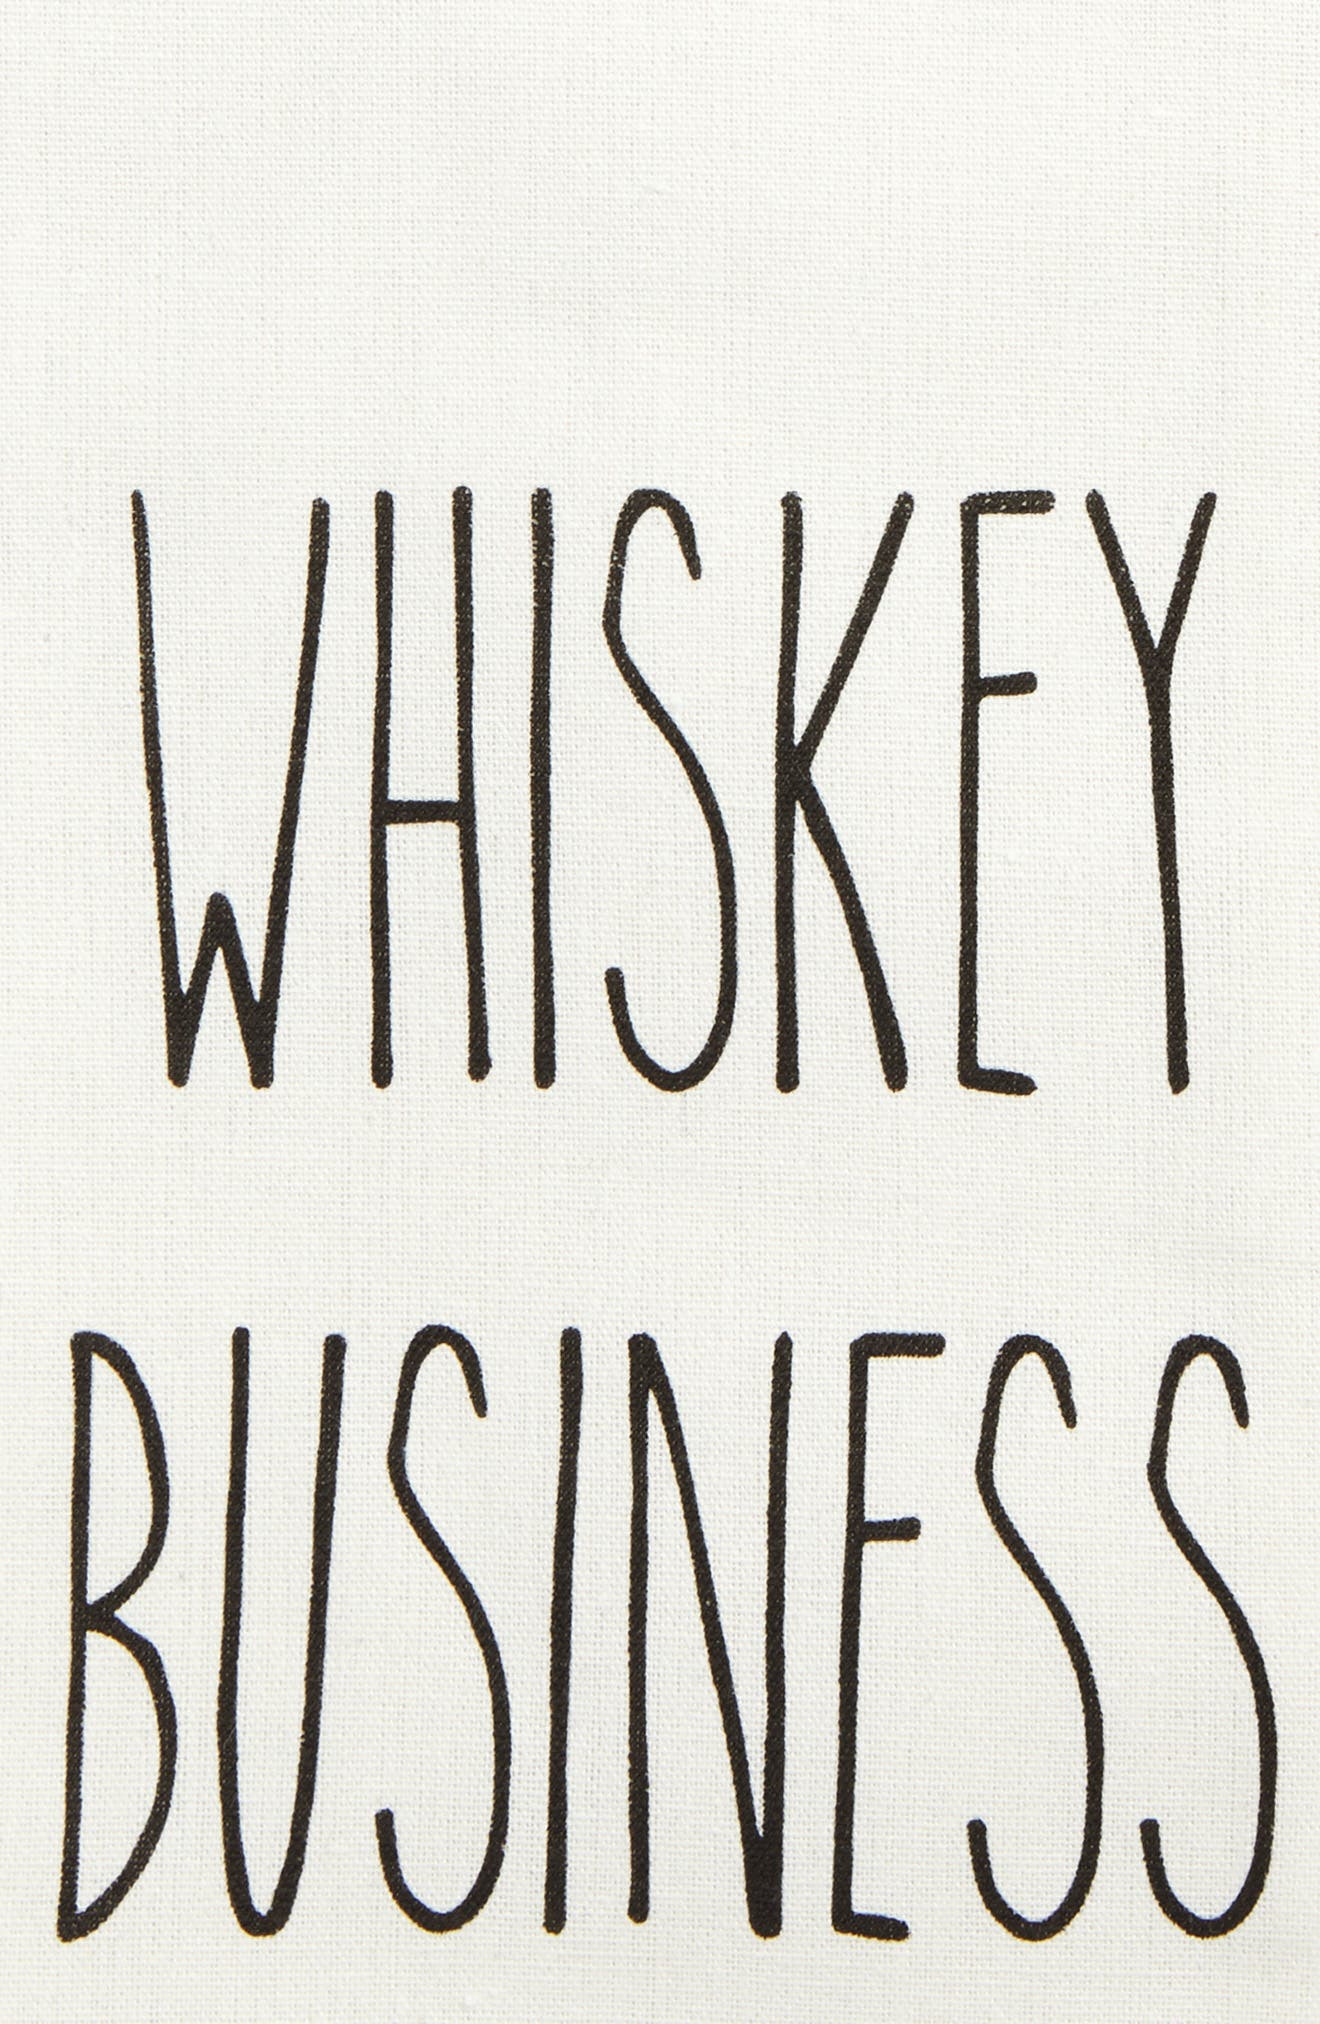 Whiskey Business Set of 2 Dishtowels,                             Alternate thumbnail 2, color,                             001